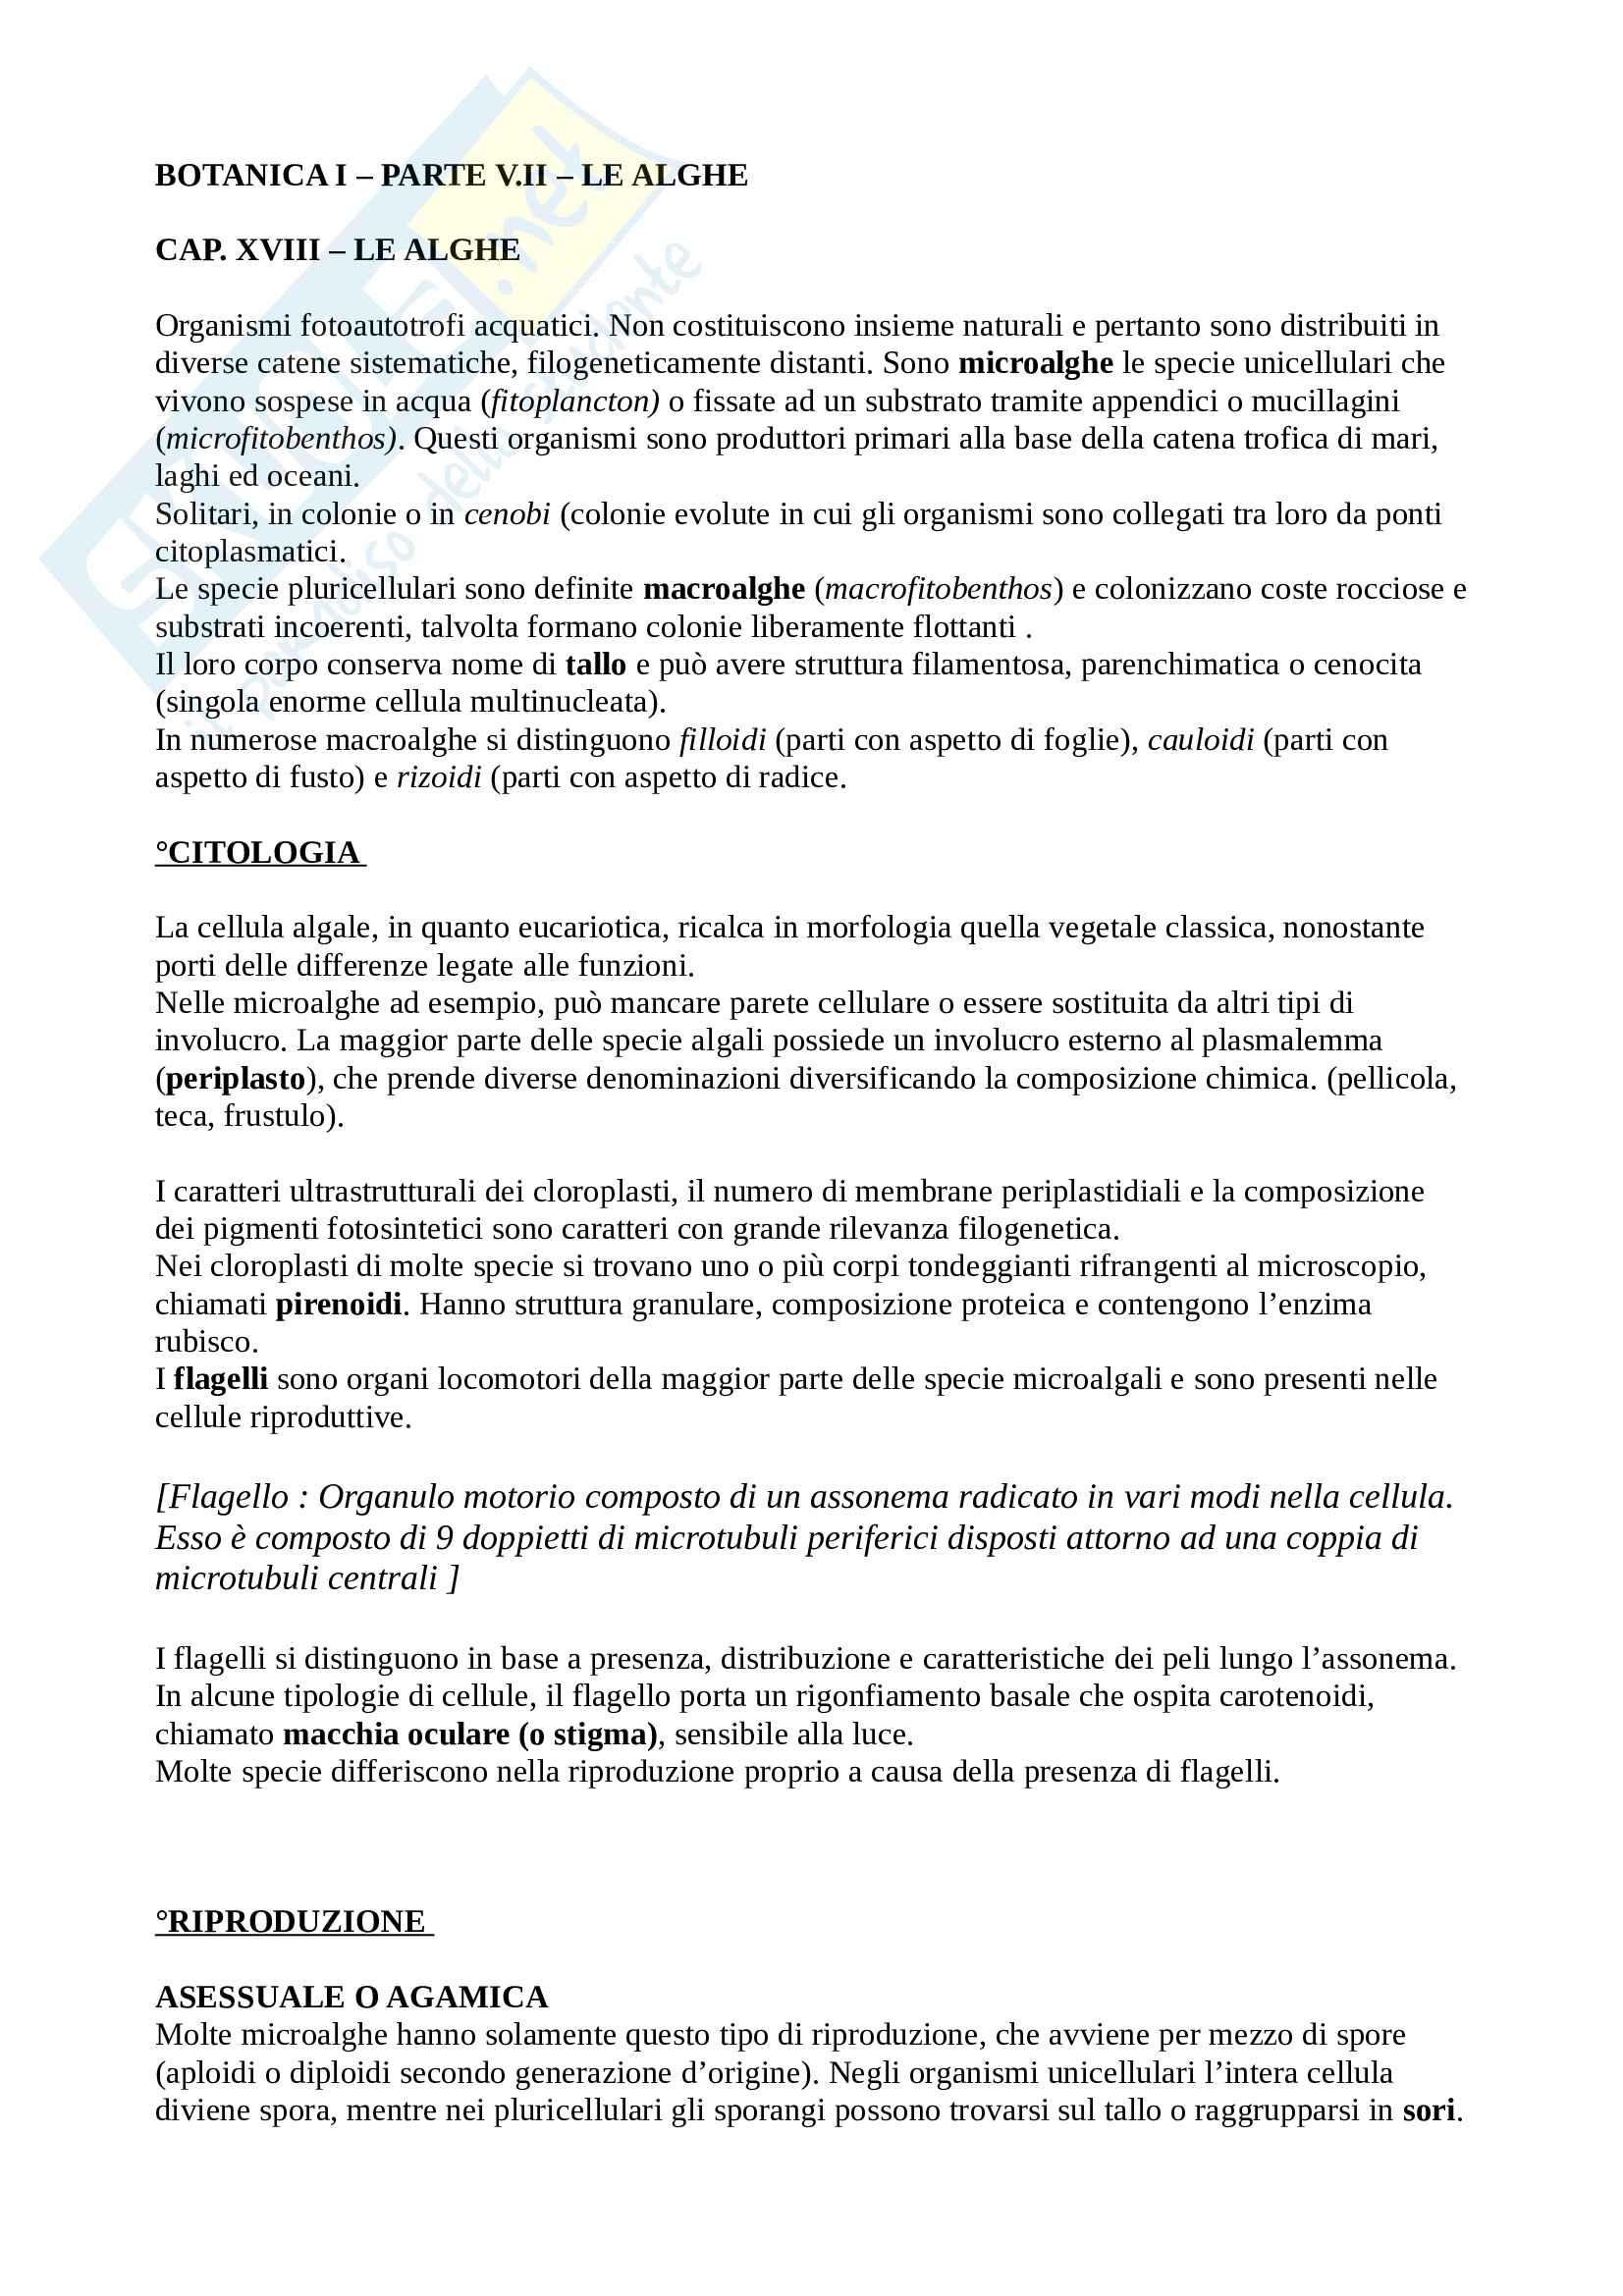 Botanica Generale - Parte VII - Le Alghe